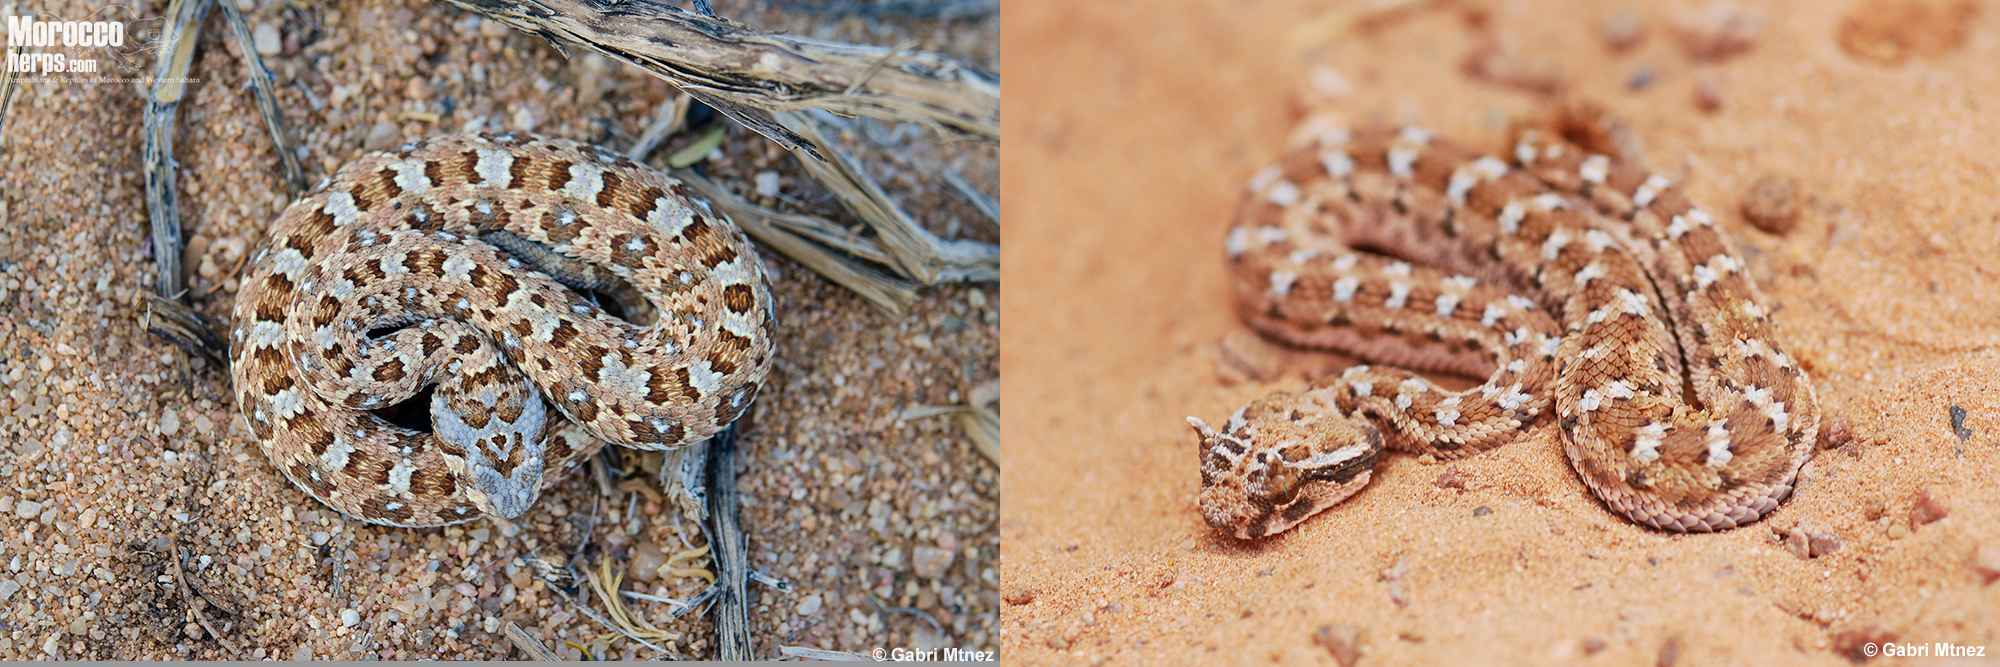 Bitis-caudalis-Namibia-Cerastes-cerastes- Morocco